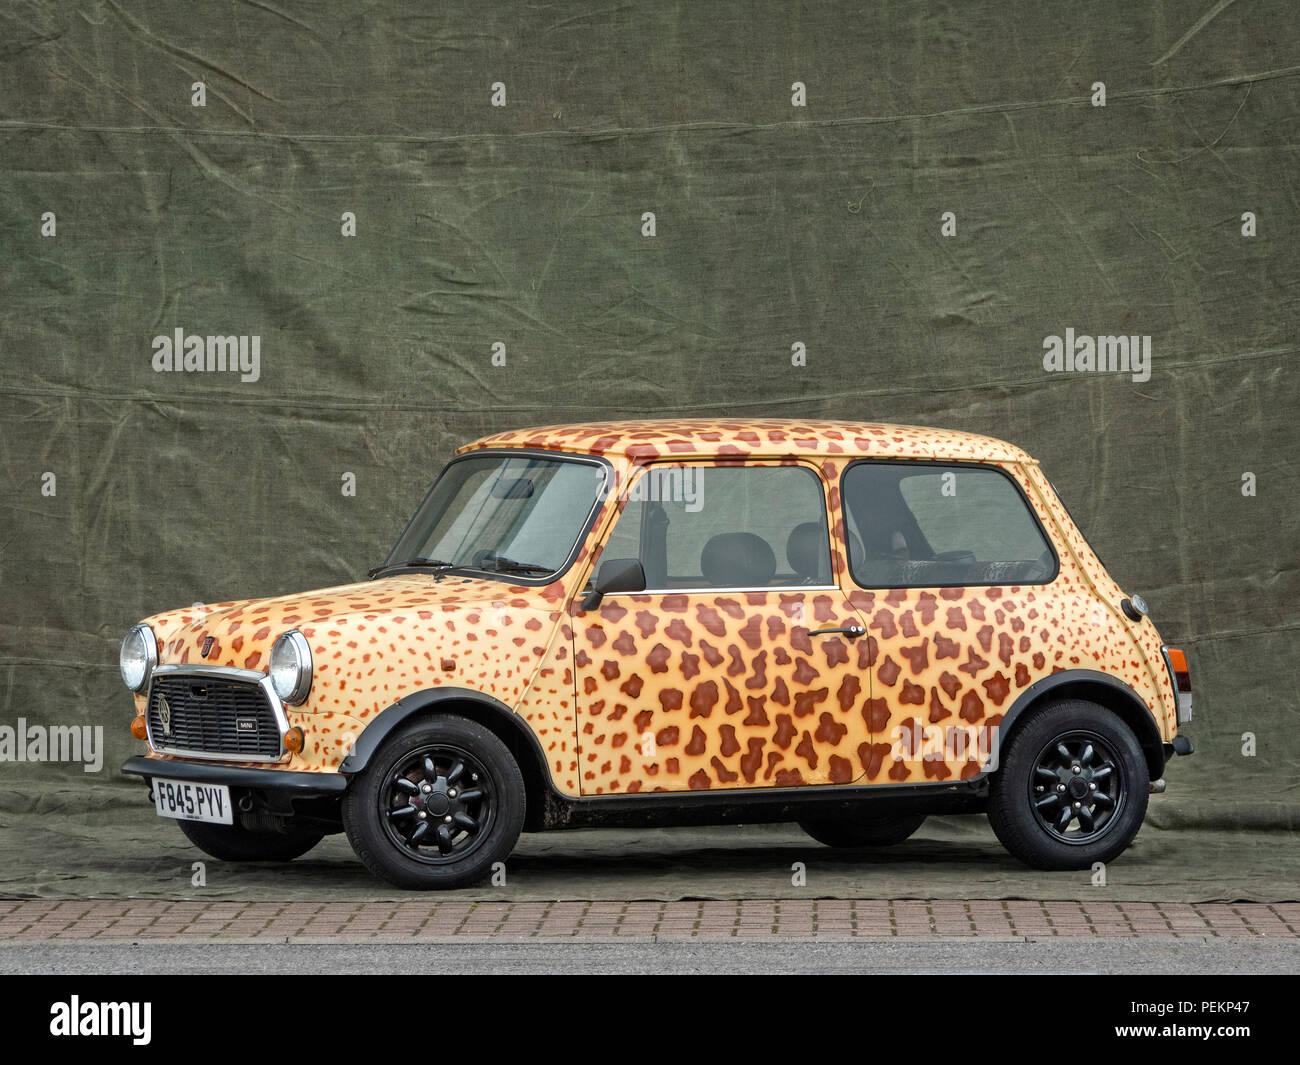 1989 Rover Mini diseño de piel de leopardo Imagen De Stock